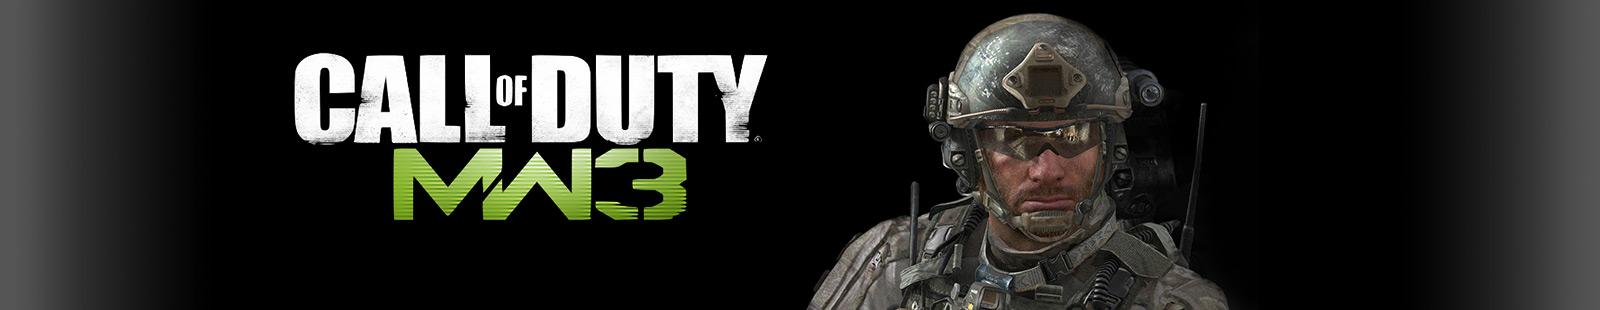 call of duty modern warfare 3 als download online kaufen. Black Bedroom Furniture Sets. Home Design Ideas